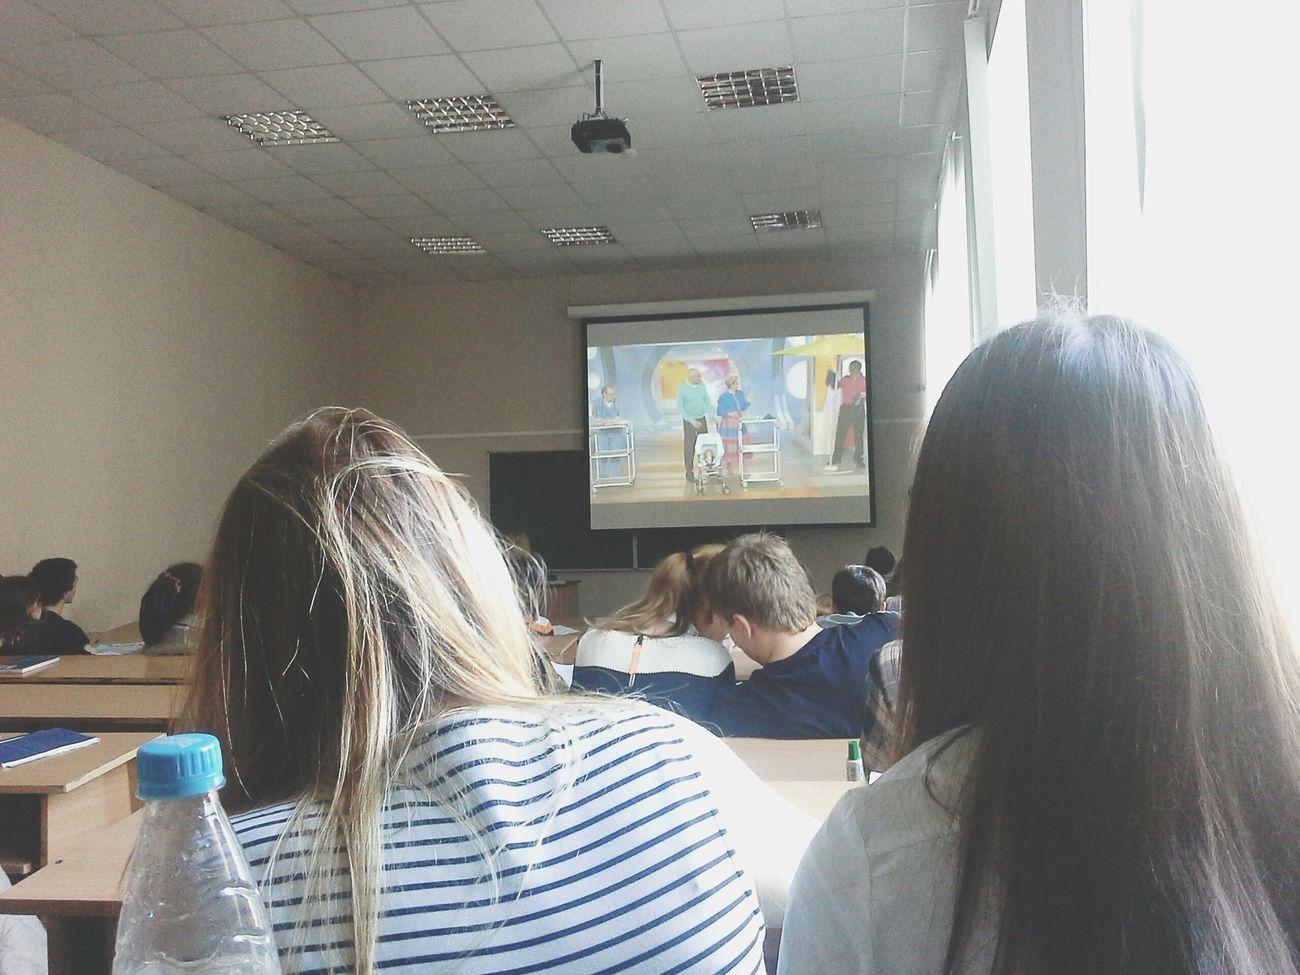 вылезла из планшета, а тут Малышева вещает D: Lecture Lecturetime University People Watching Saint-Petersburg